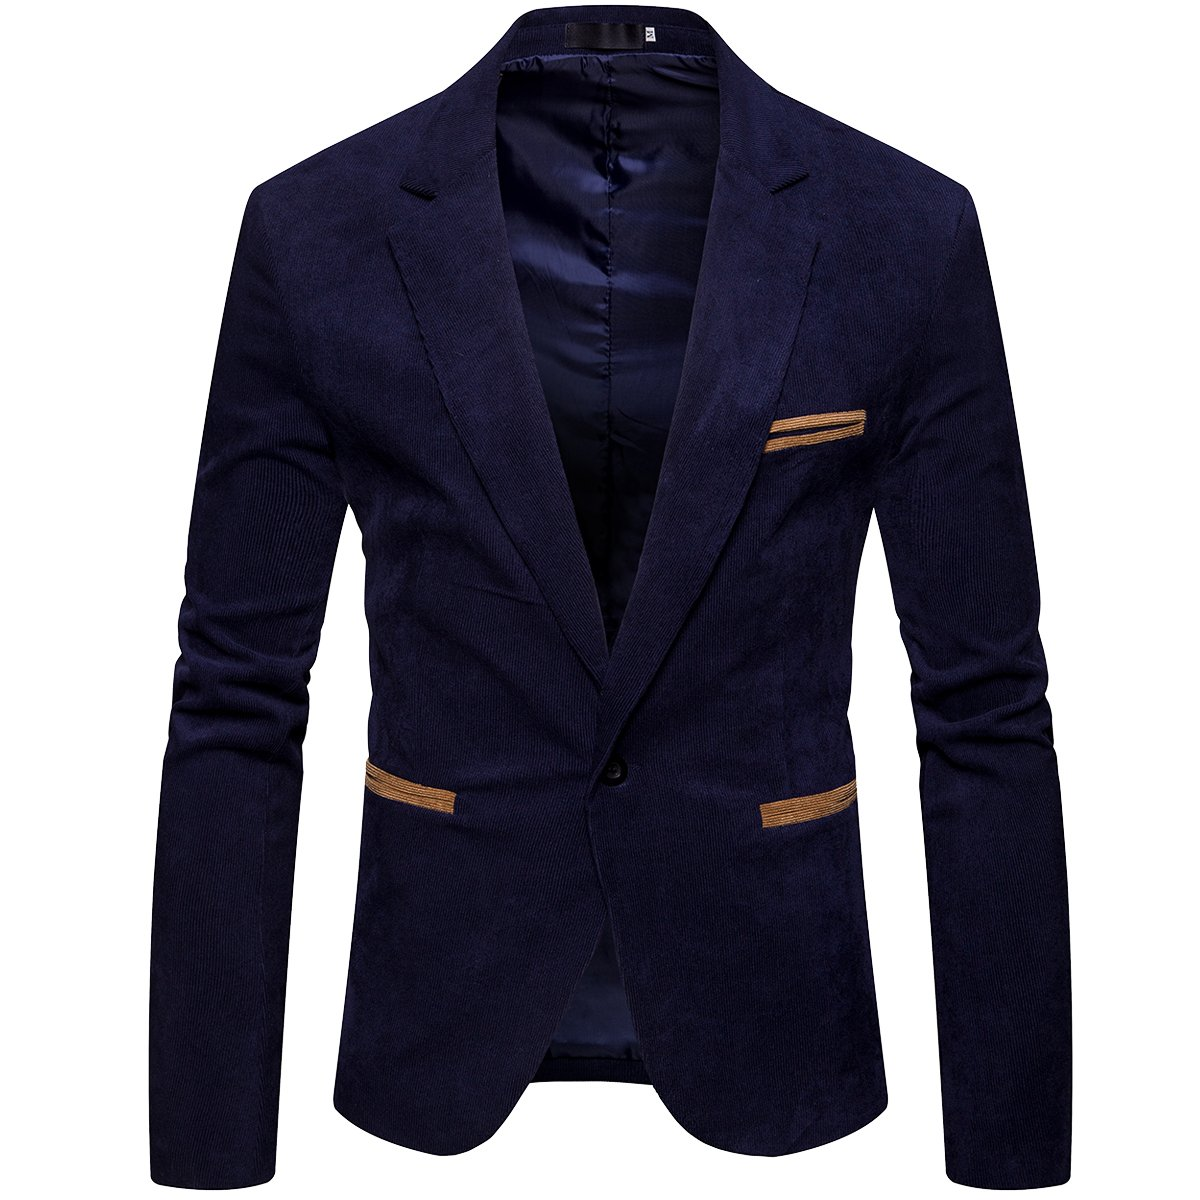 Cottory Mens Slim Fit Stylish One Button Blazer Corduroy Sport Jacket Dark Blue Small